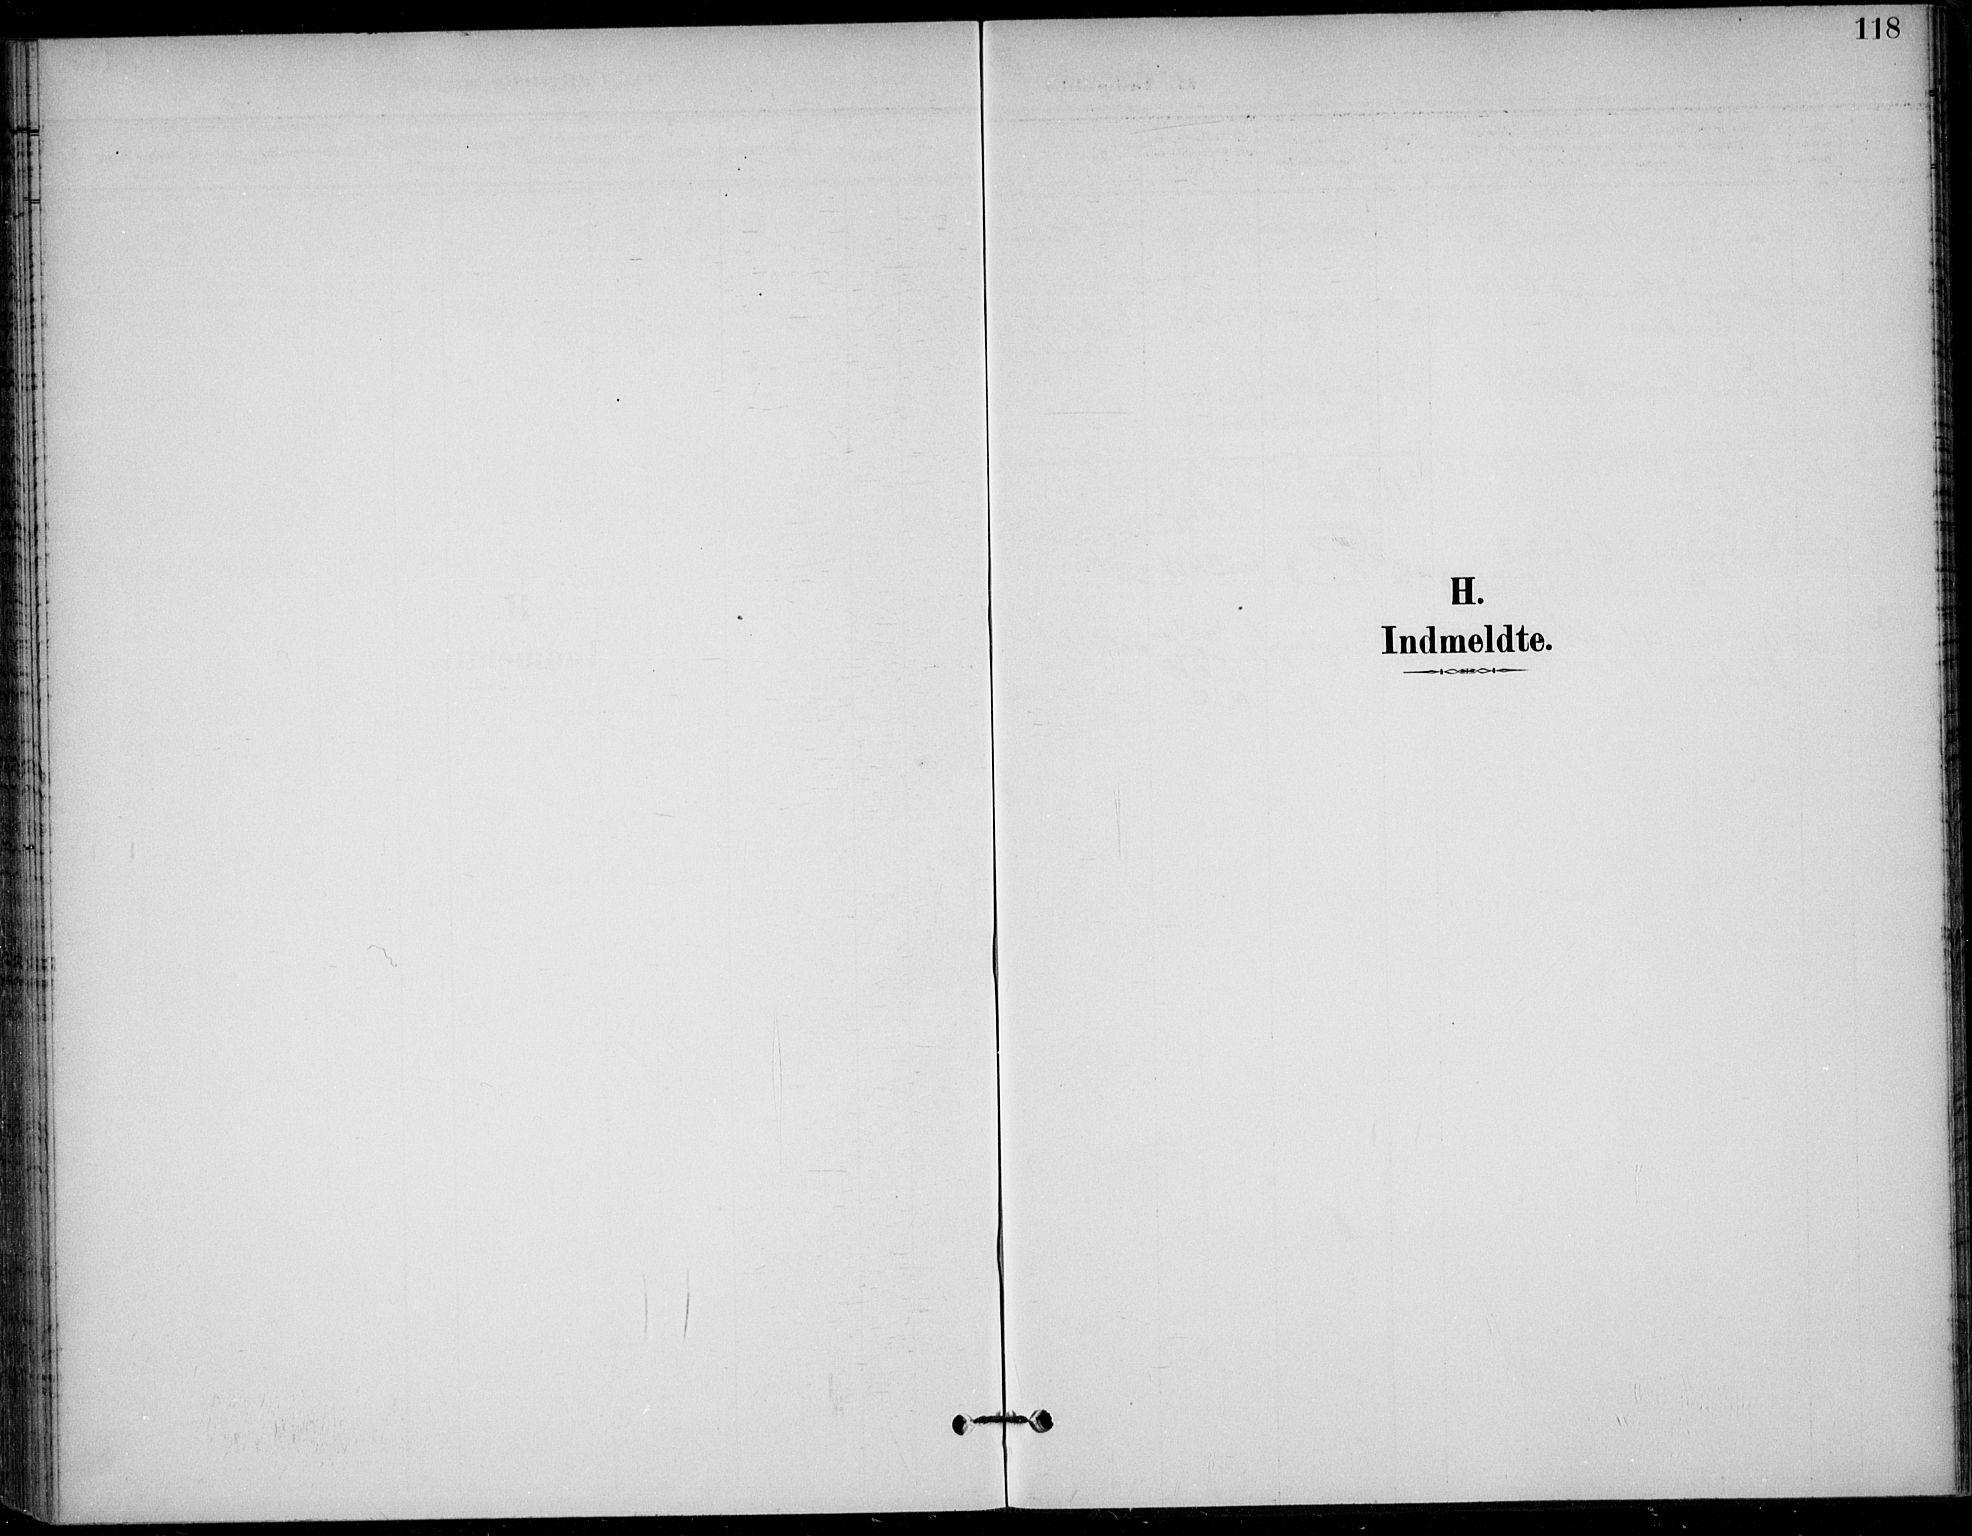 SAKO, Solum kirkebøker, F/Fc/L0002: Ministerialbok nr. III 2, 1892-1906, s. 118